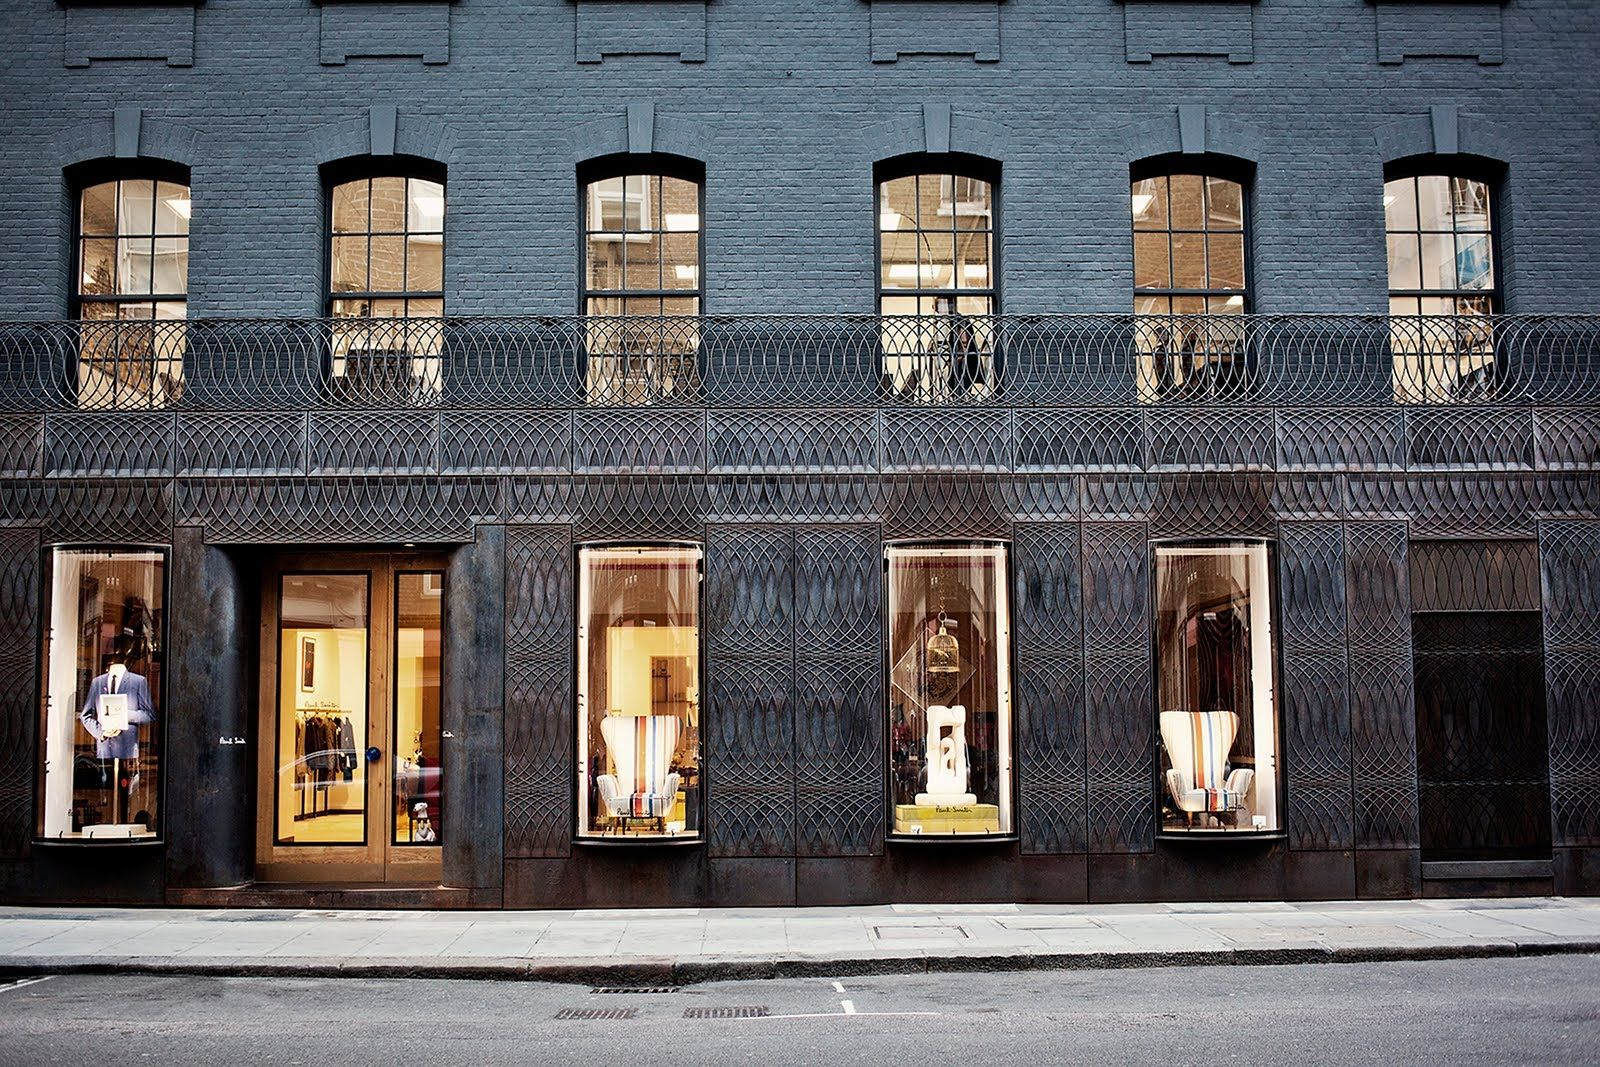 Paul Smith Shop Facade Architecture Architecture Architect